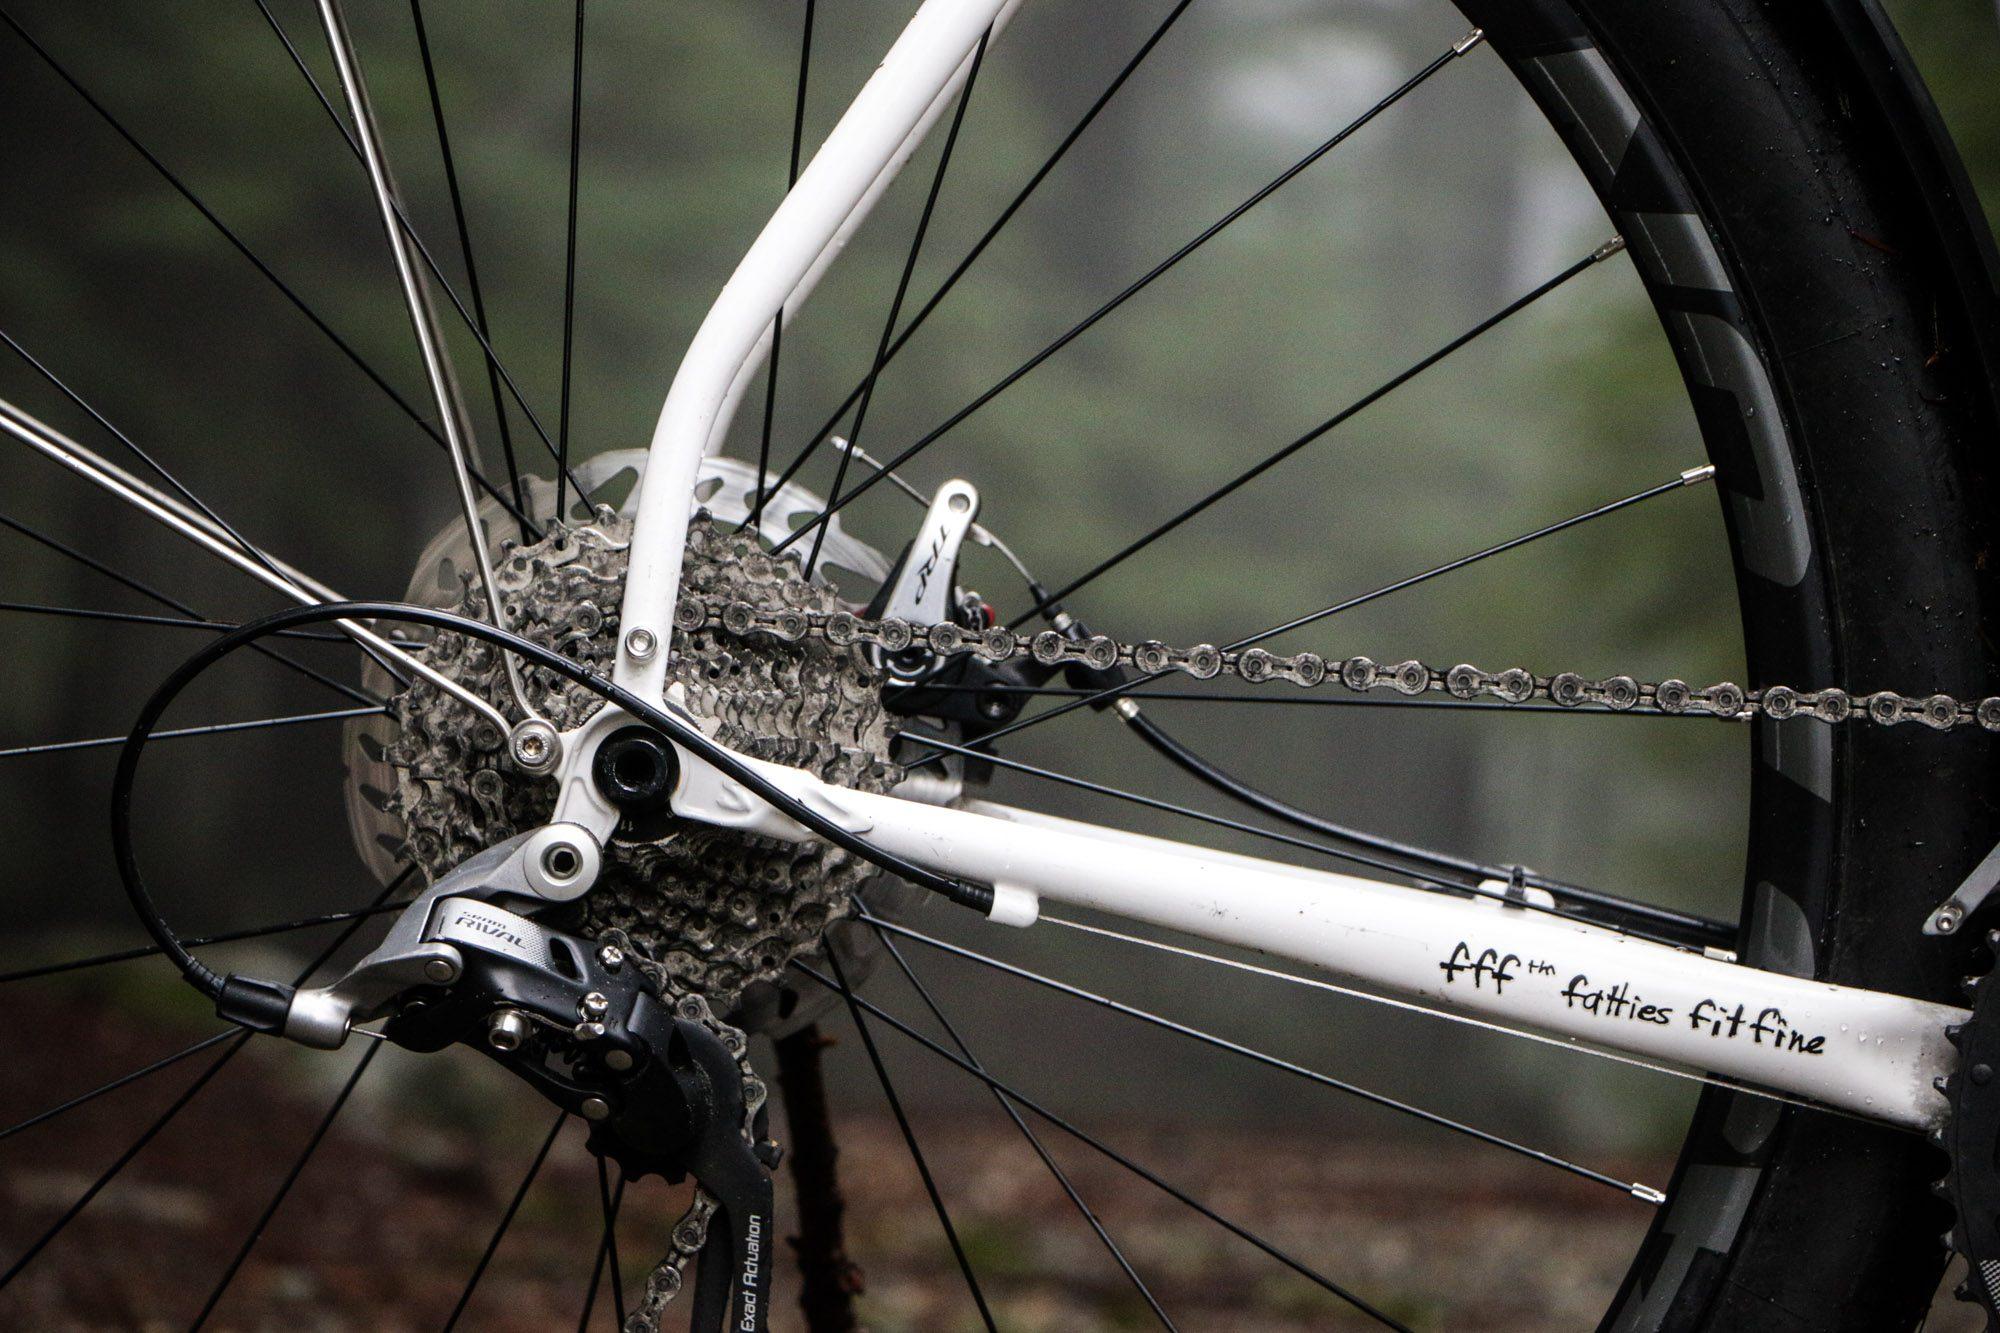 Bracket bike repair replace bottom